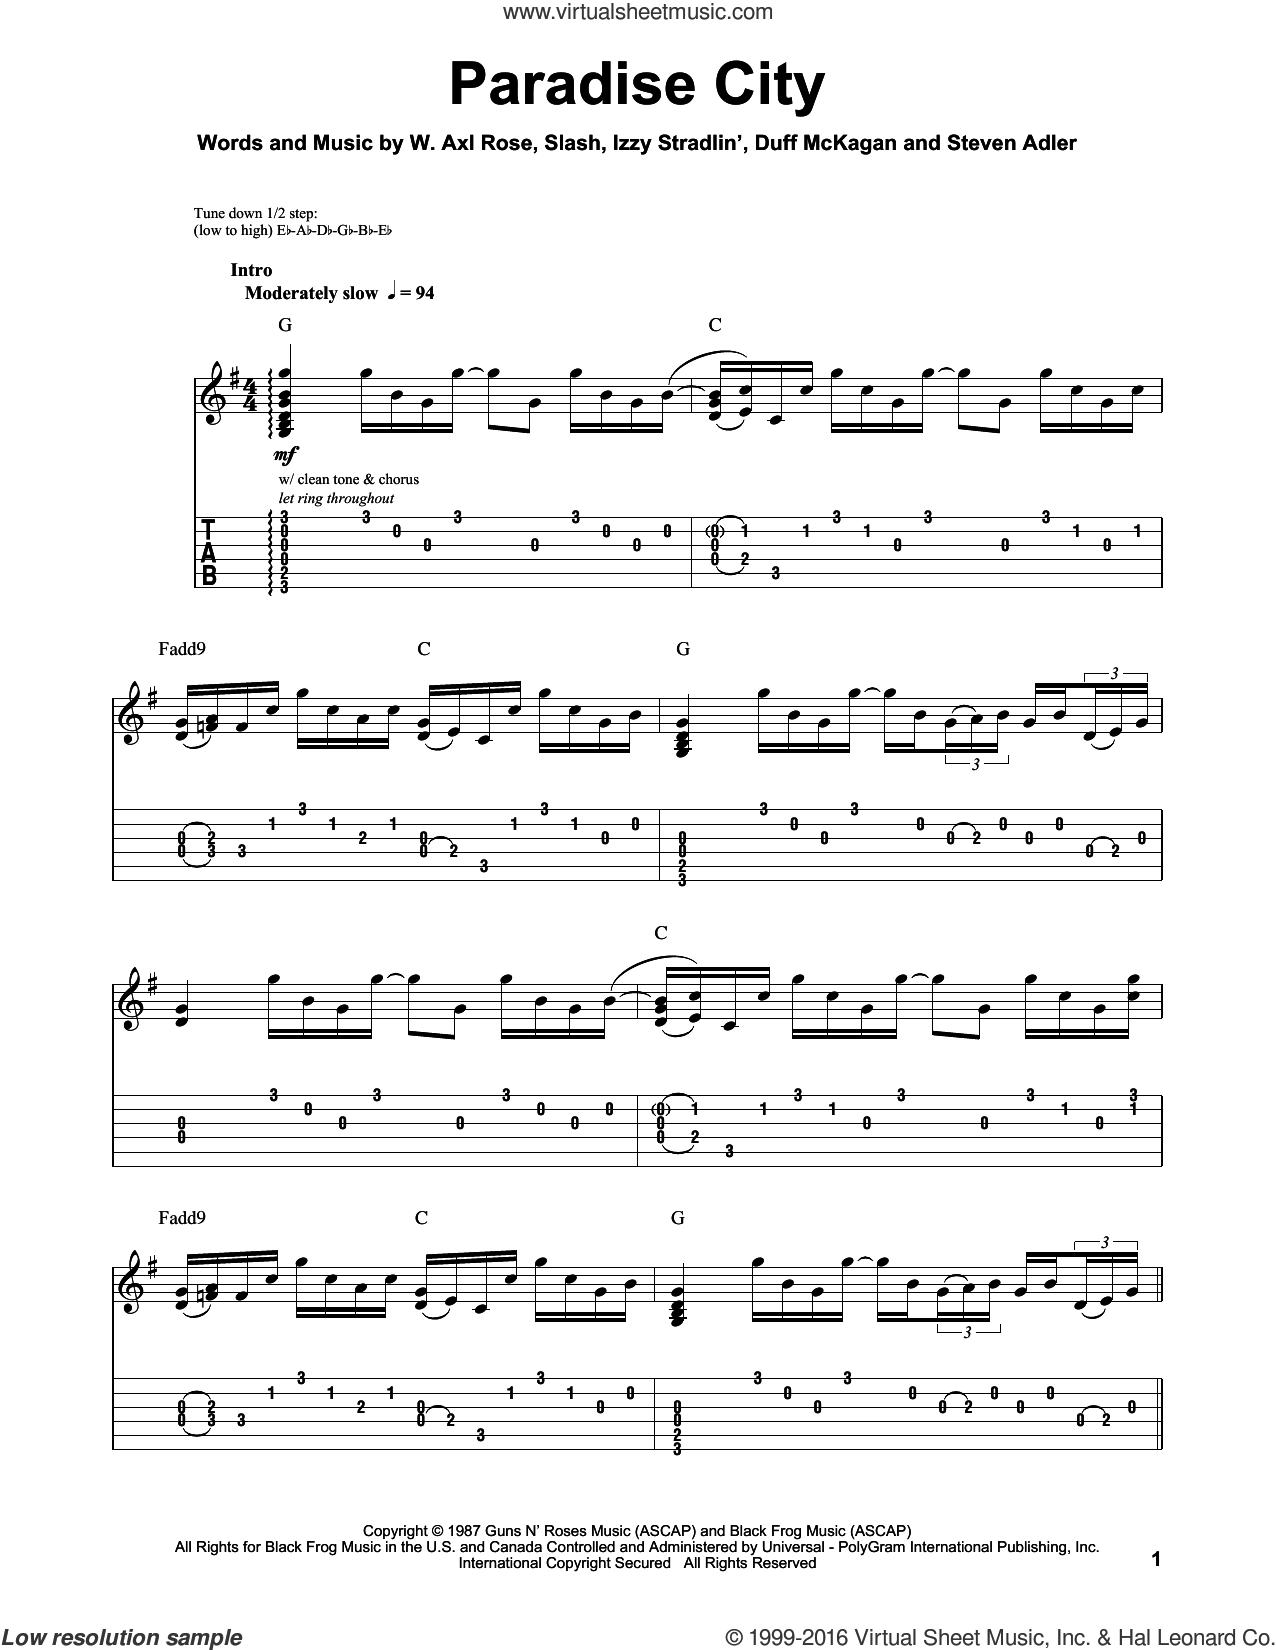 Paradise City sheet music for guitar (tablature, play-along) by Guns N' Roses, Axl Rose, Duff McKagan, Slash and Steven Adler, intermediate skill level